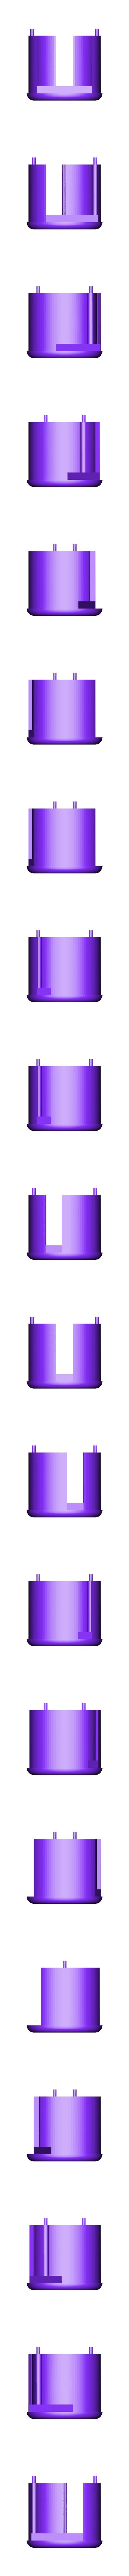 indre_top.stl Download free STL file B&O Speaker: Creative 9 • 3D printable design, Werthrante